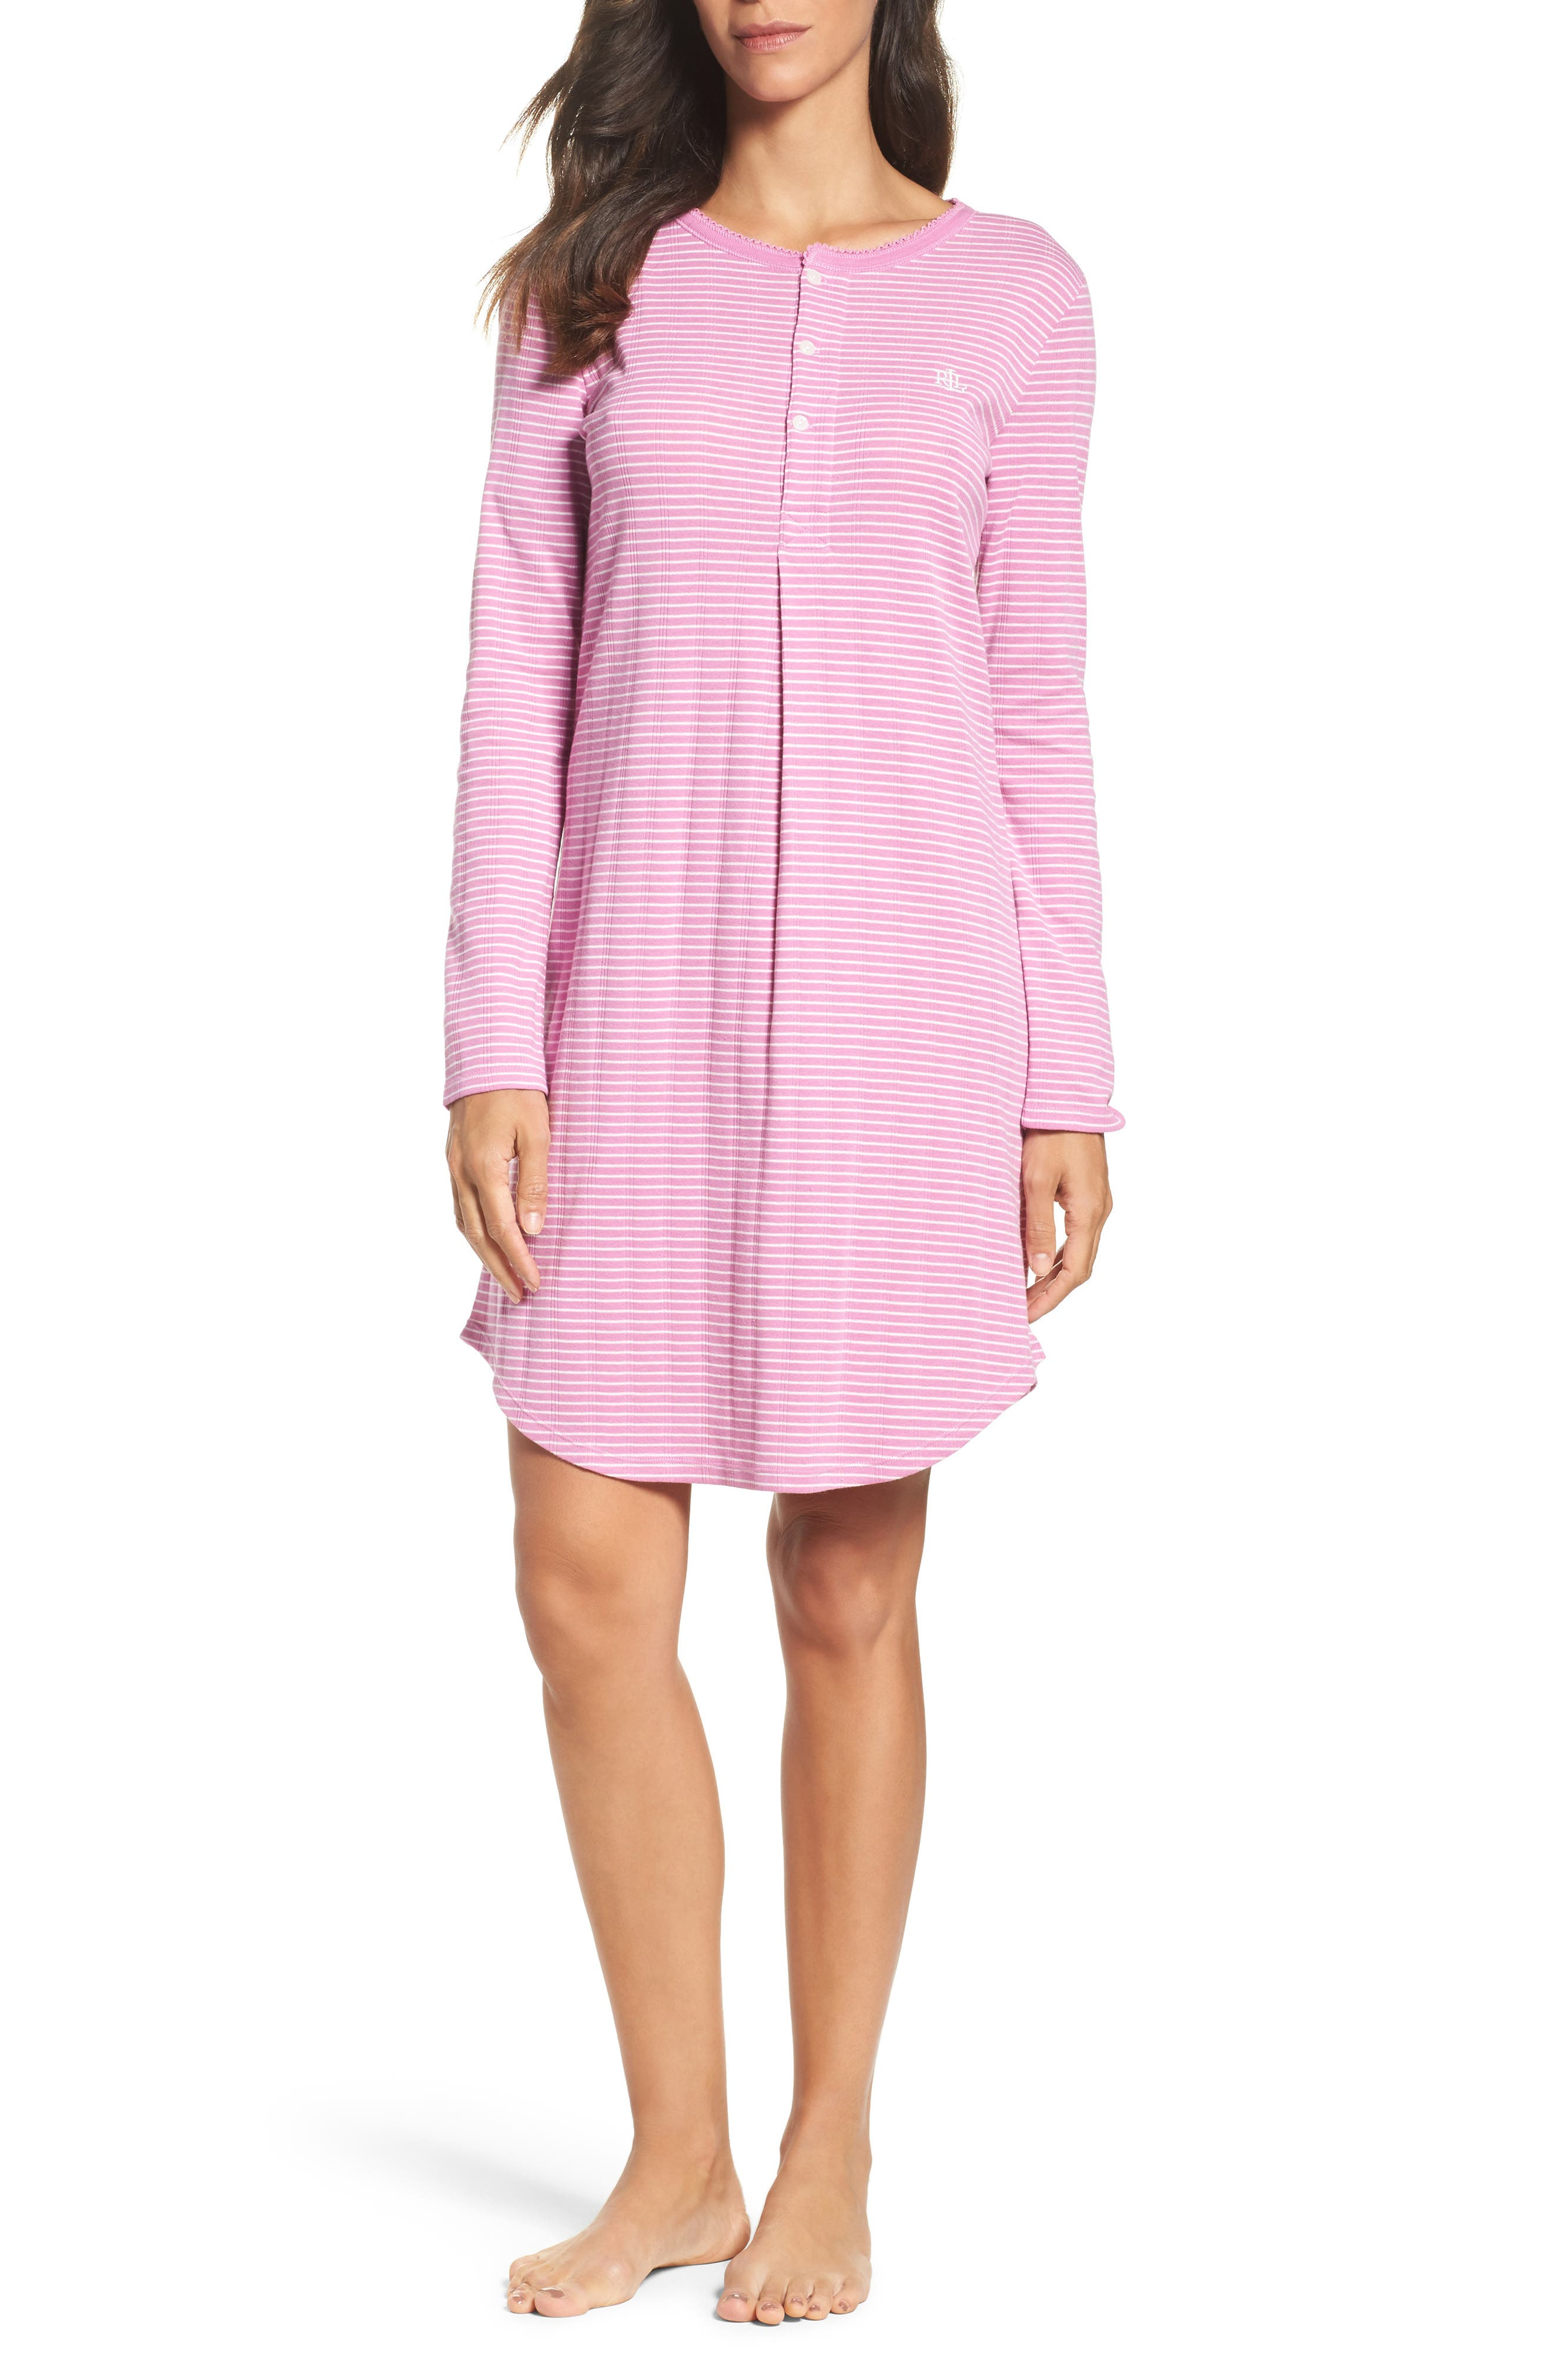 Stripe Henley Sleep Shirt,                         Main,                         color, Pink/ White Stripe